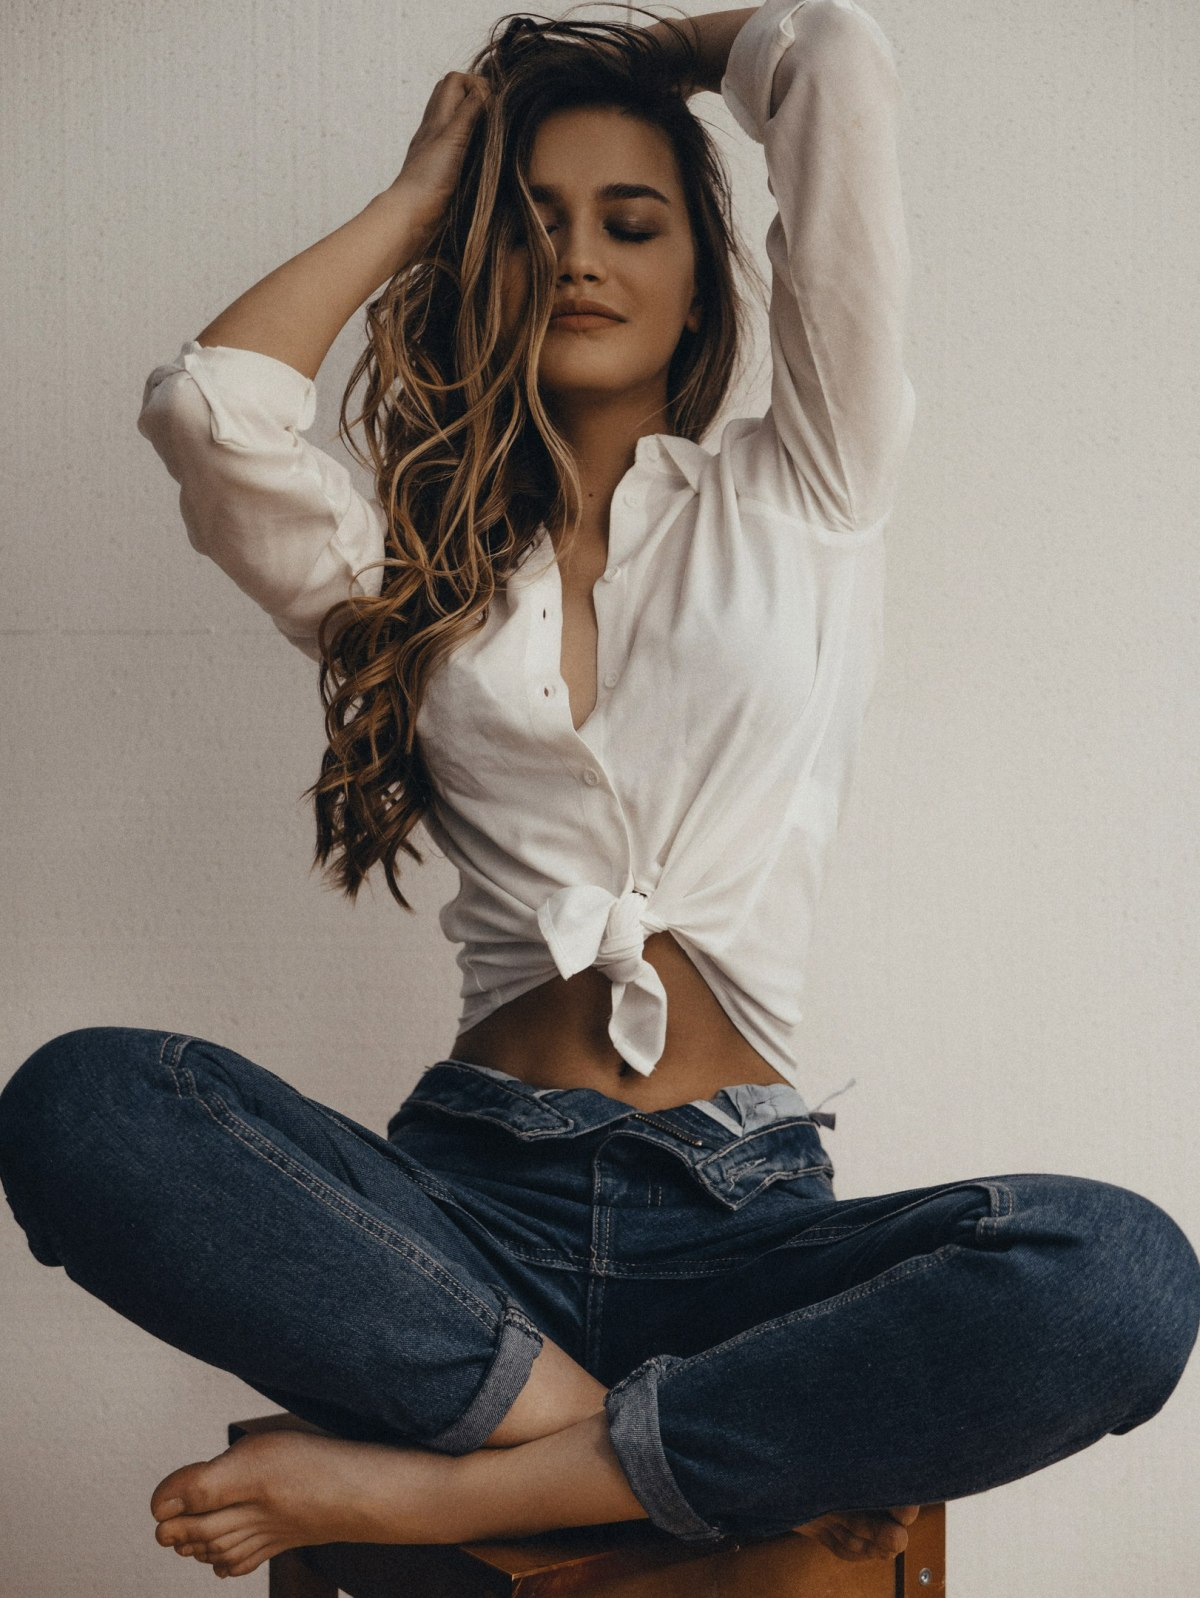 Anastasia Lis by Olga Sturikova